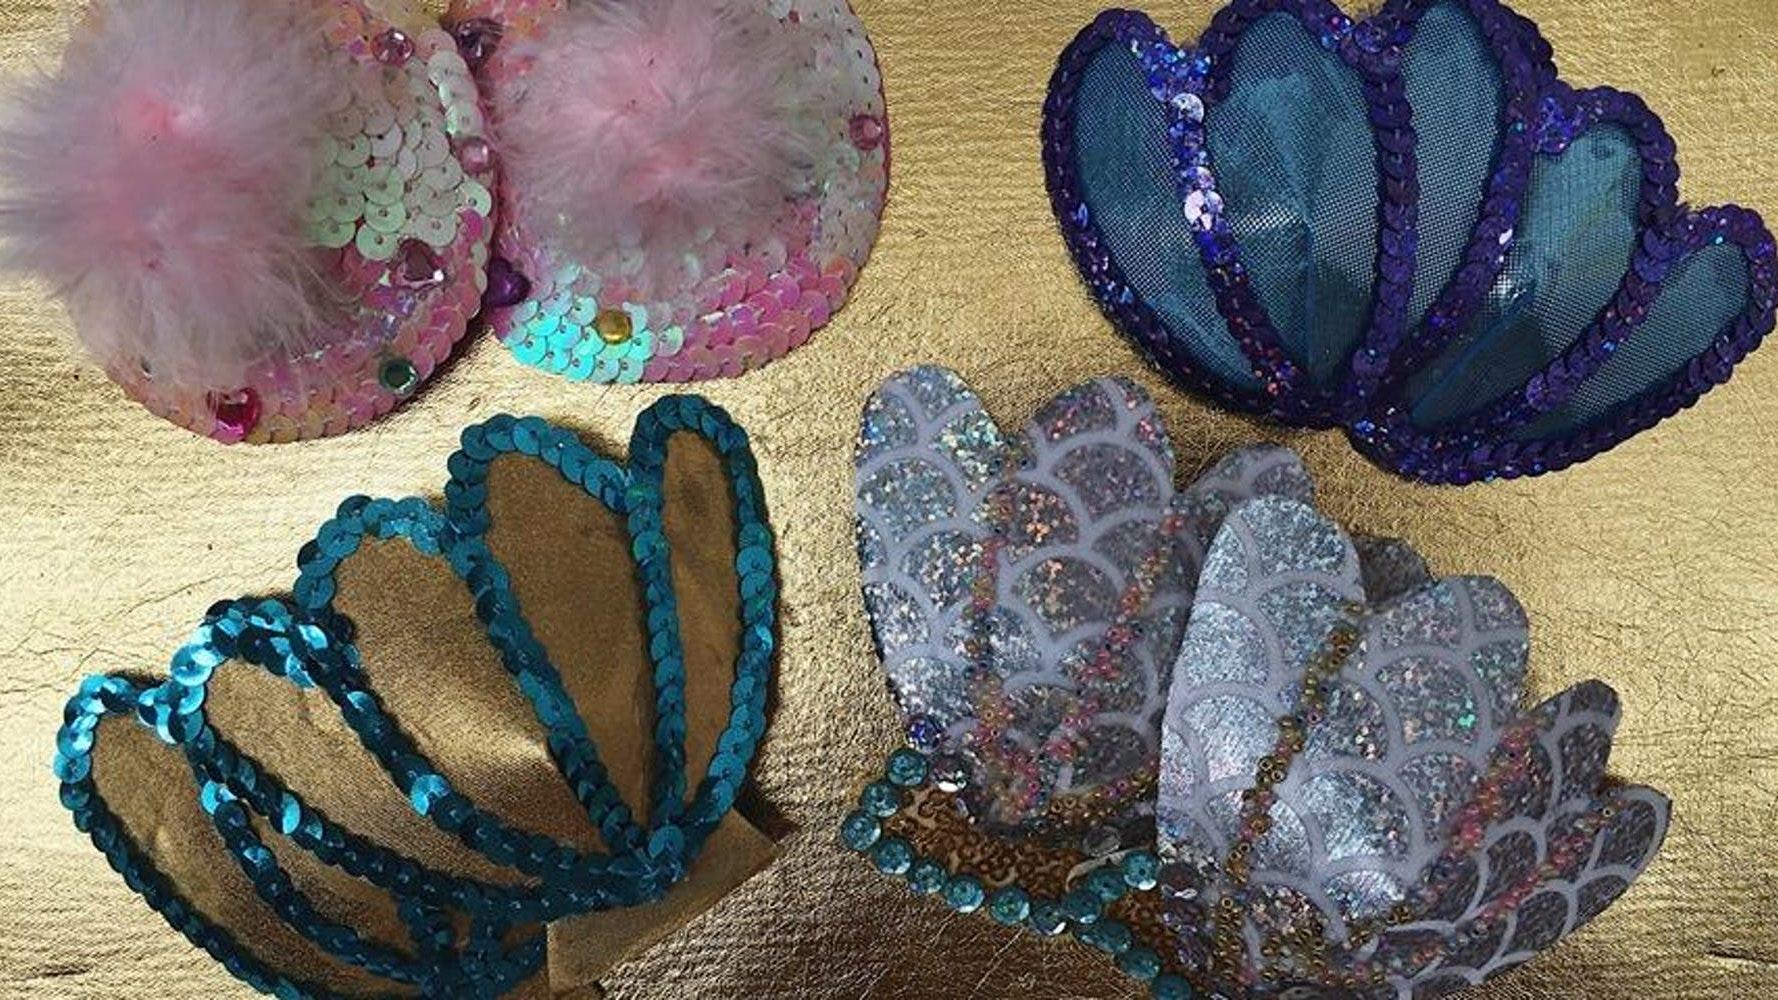 Festive Nipple Tassels